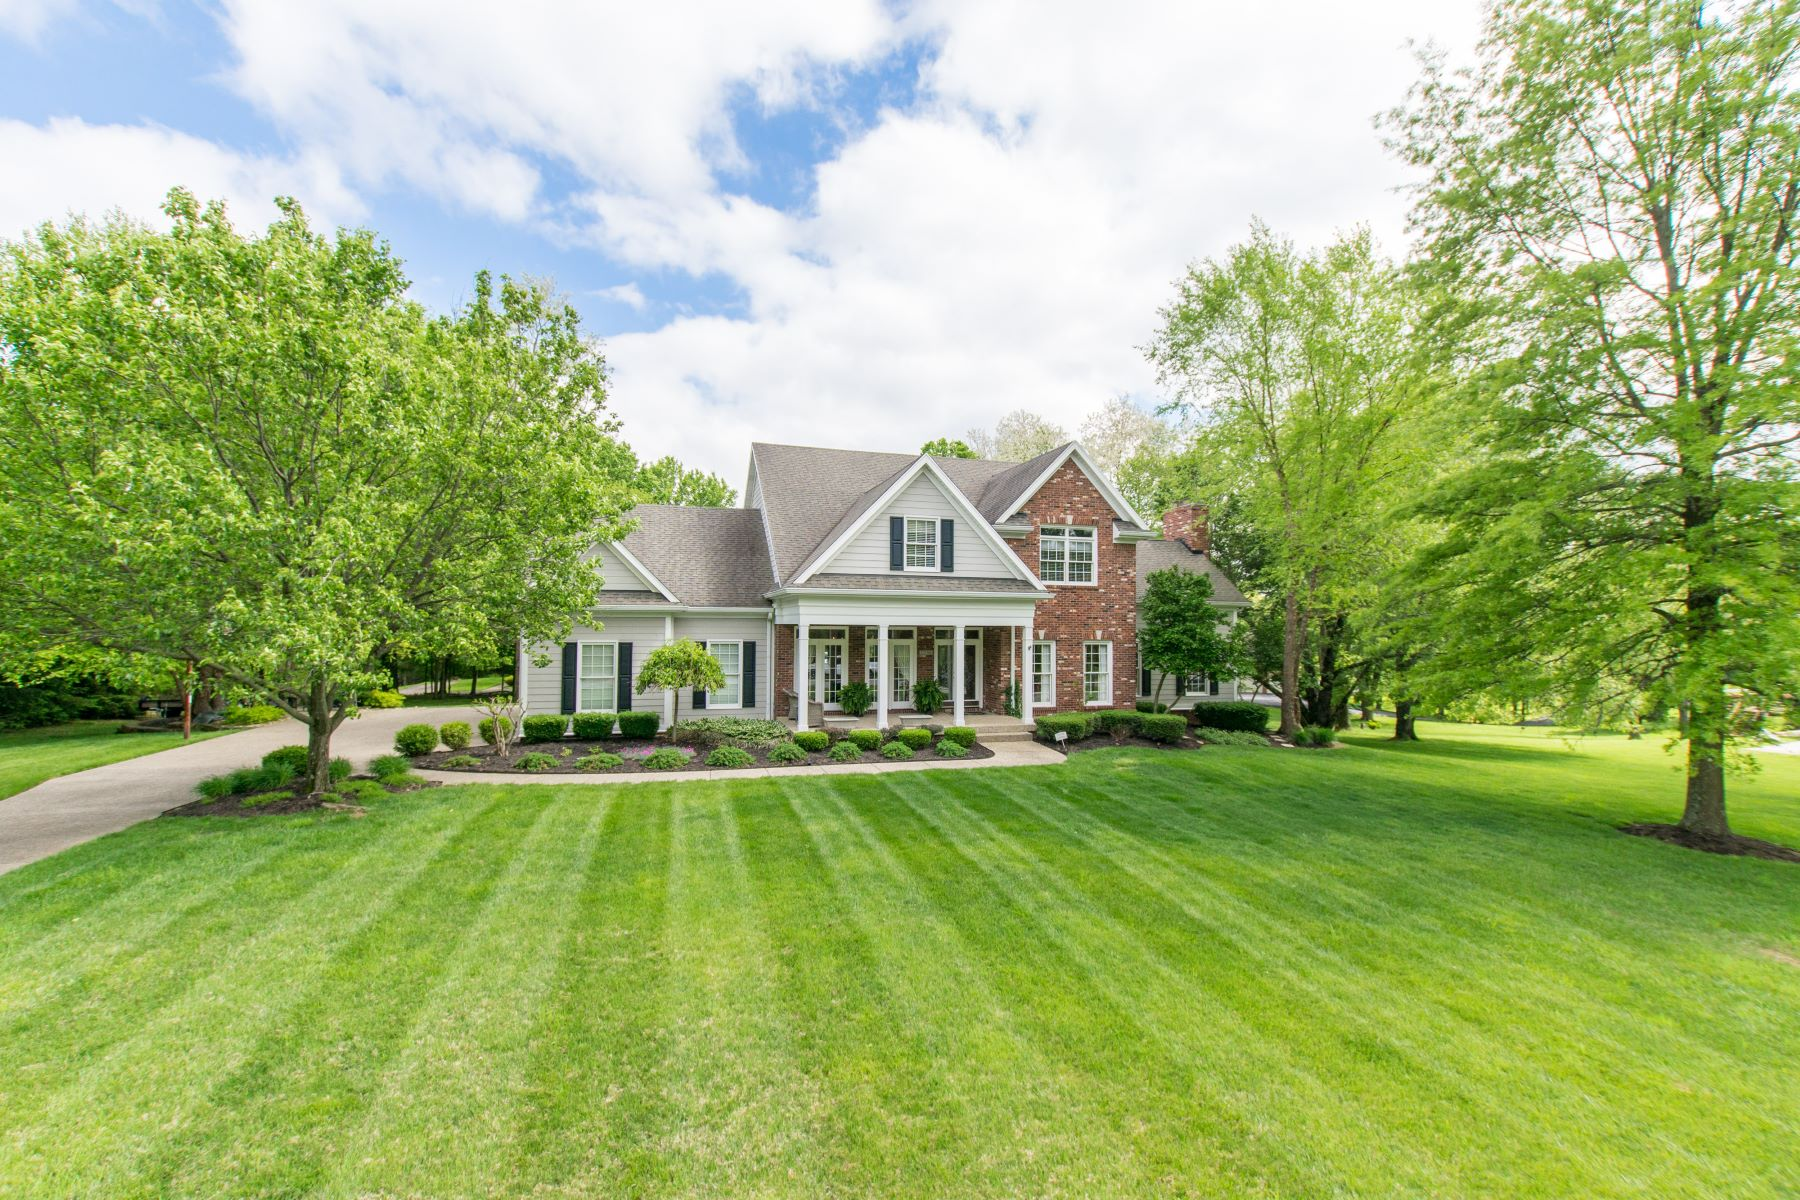 Casa para uma família para Venda às 13000 Reading Road Goshen, Kentucky, 40026 Estados Unidos